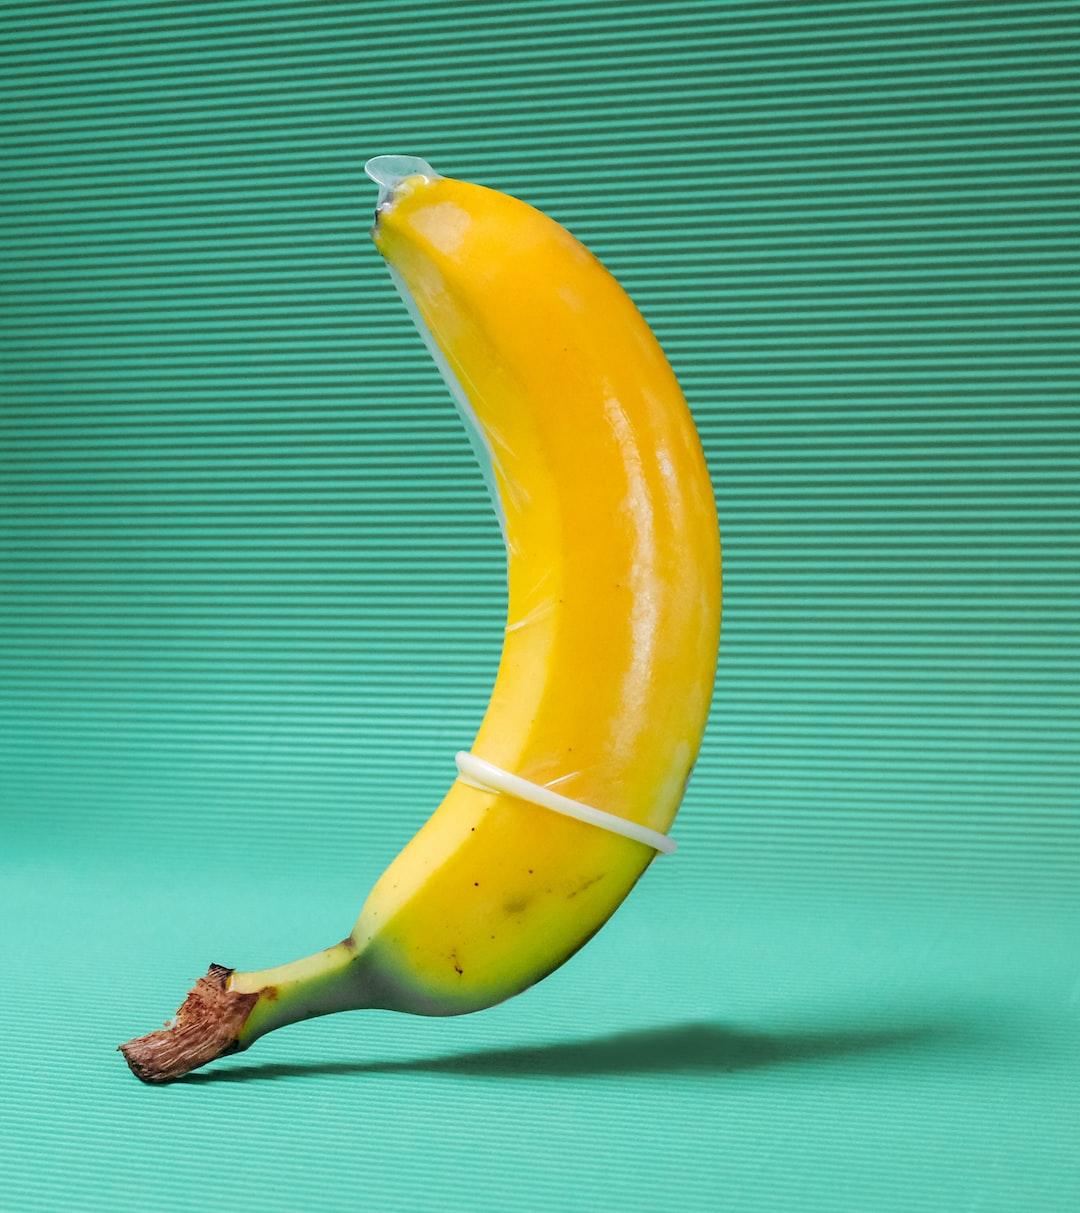 Sex Education: Banana